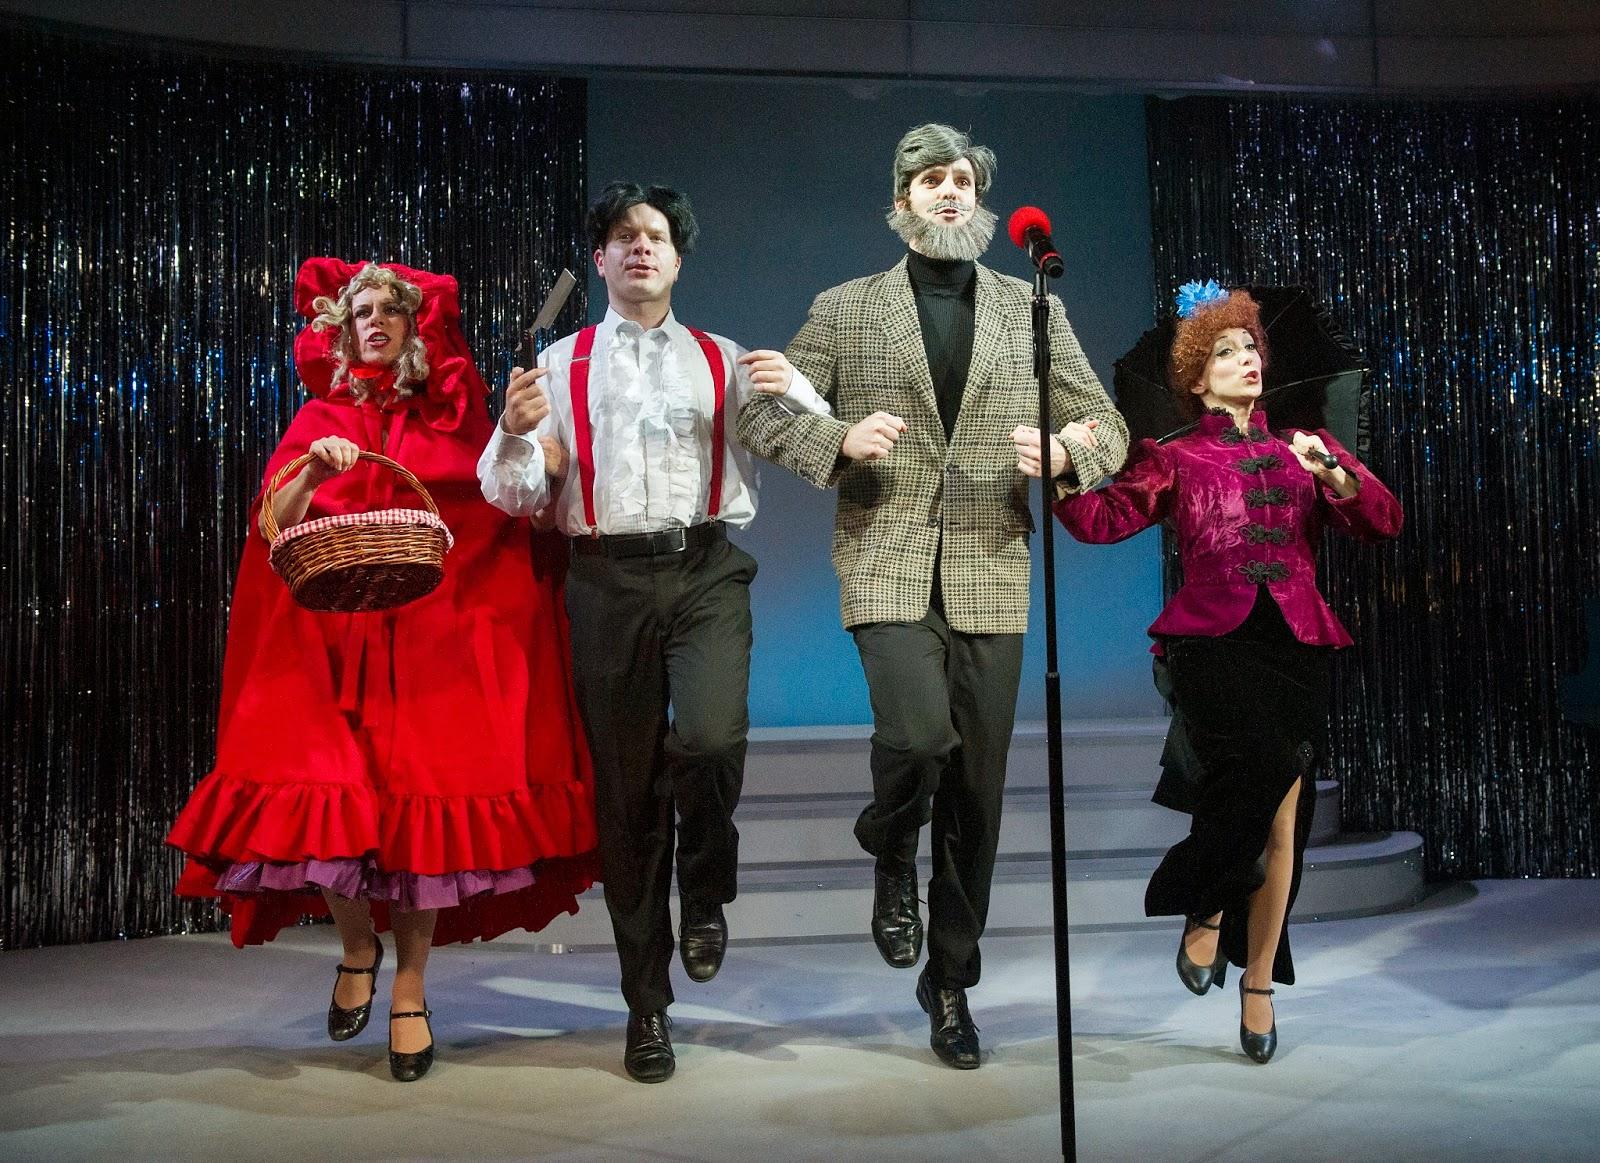 Forbidden+Broadway+by+Gerard+Alessandrini.+Anna+Jane+Casey,+Damian+Humbley,+Ben+